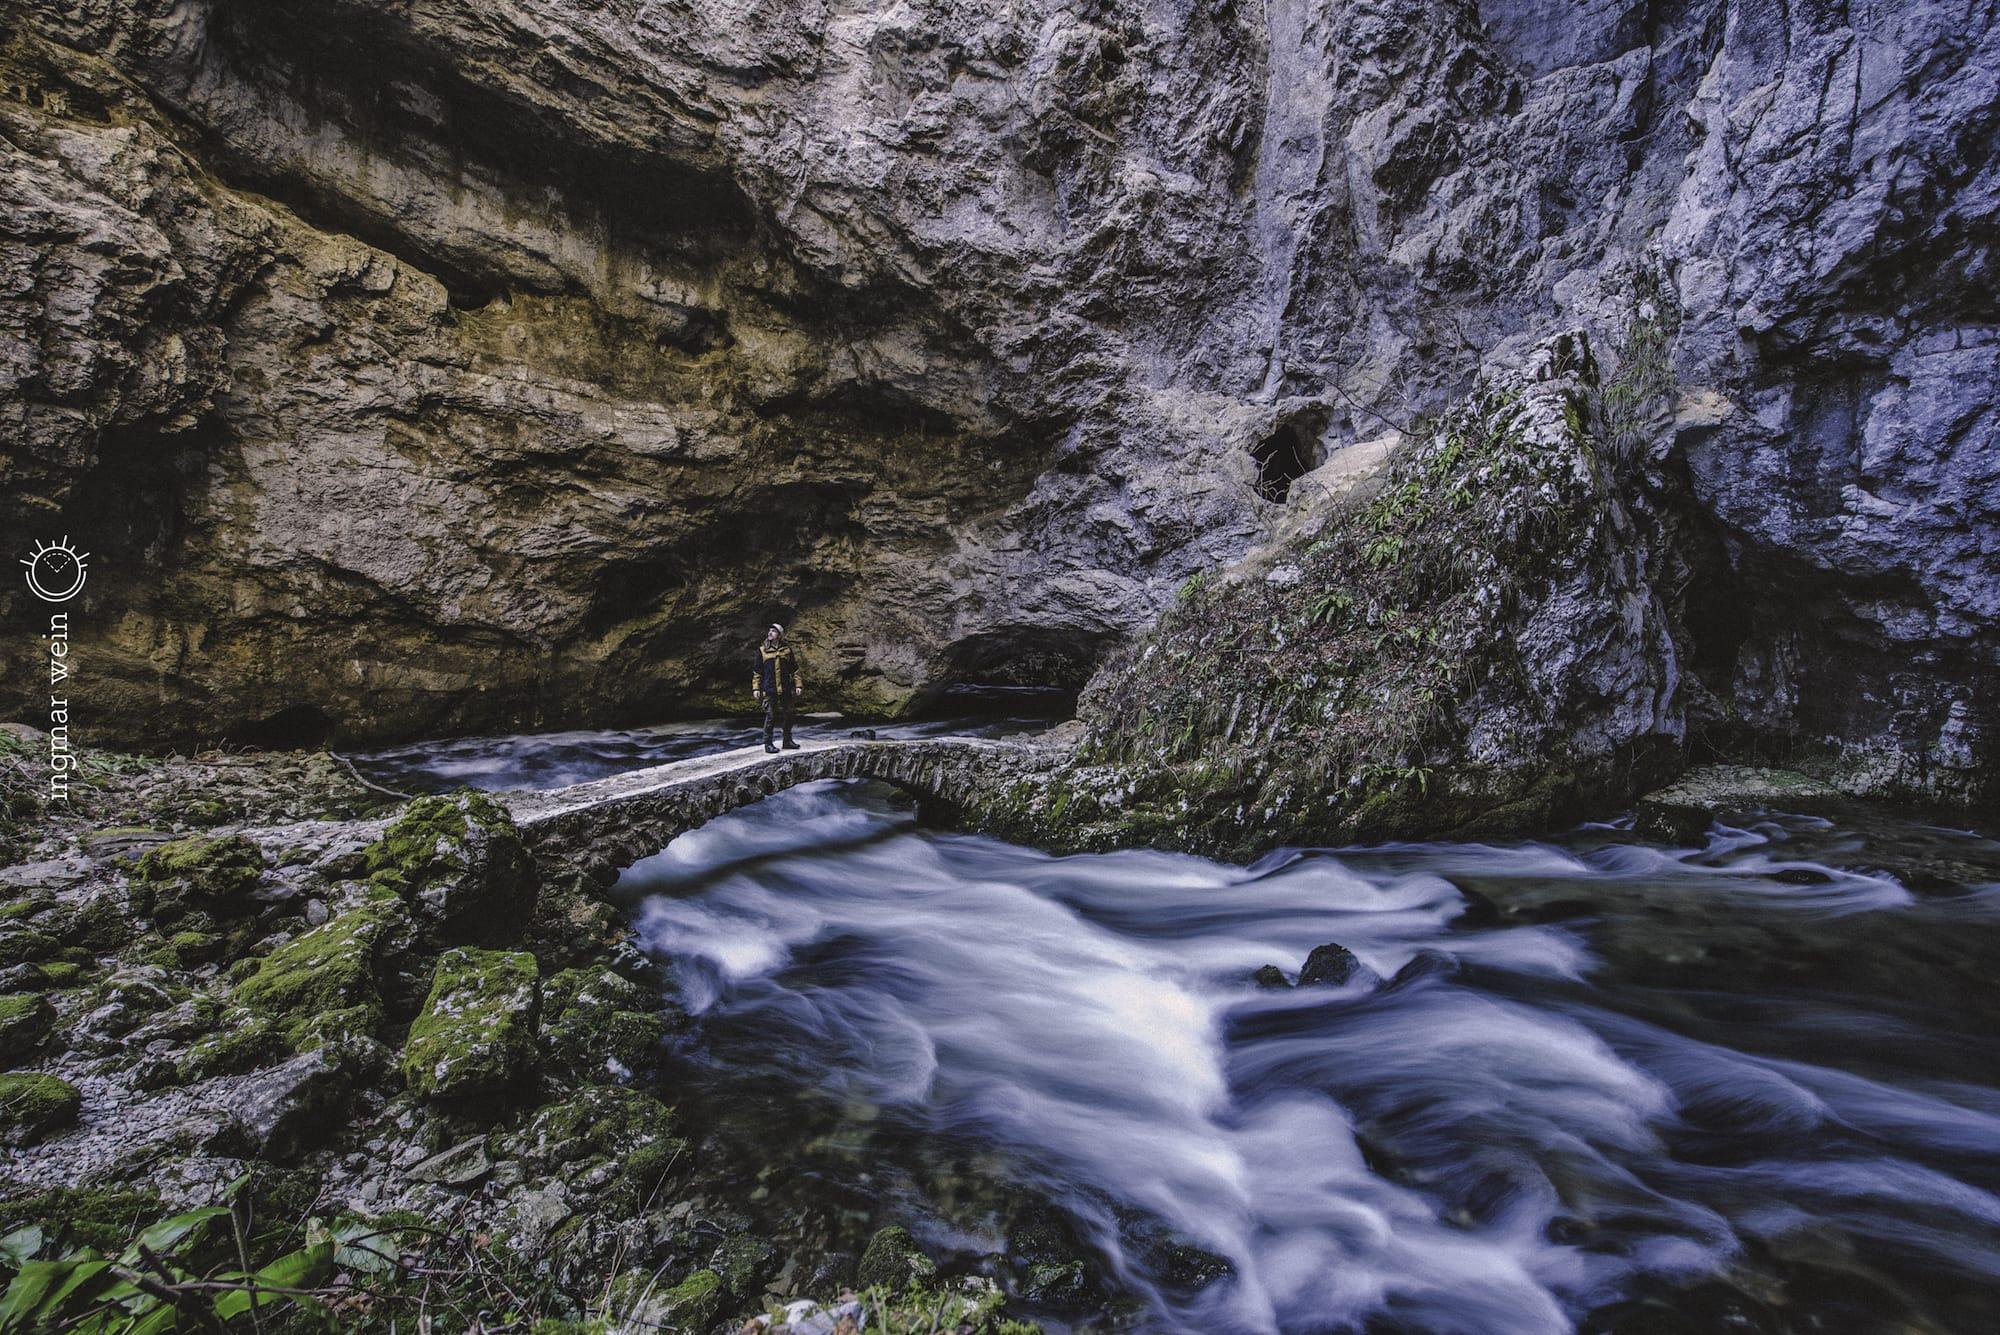 Visiting Green Slovenia